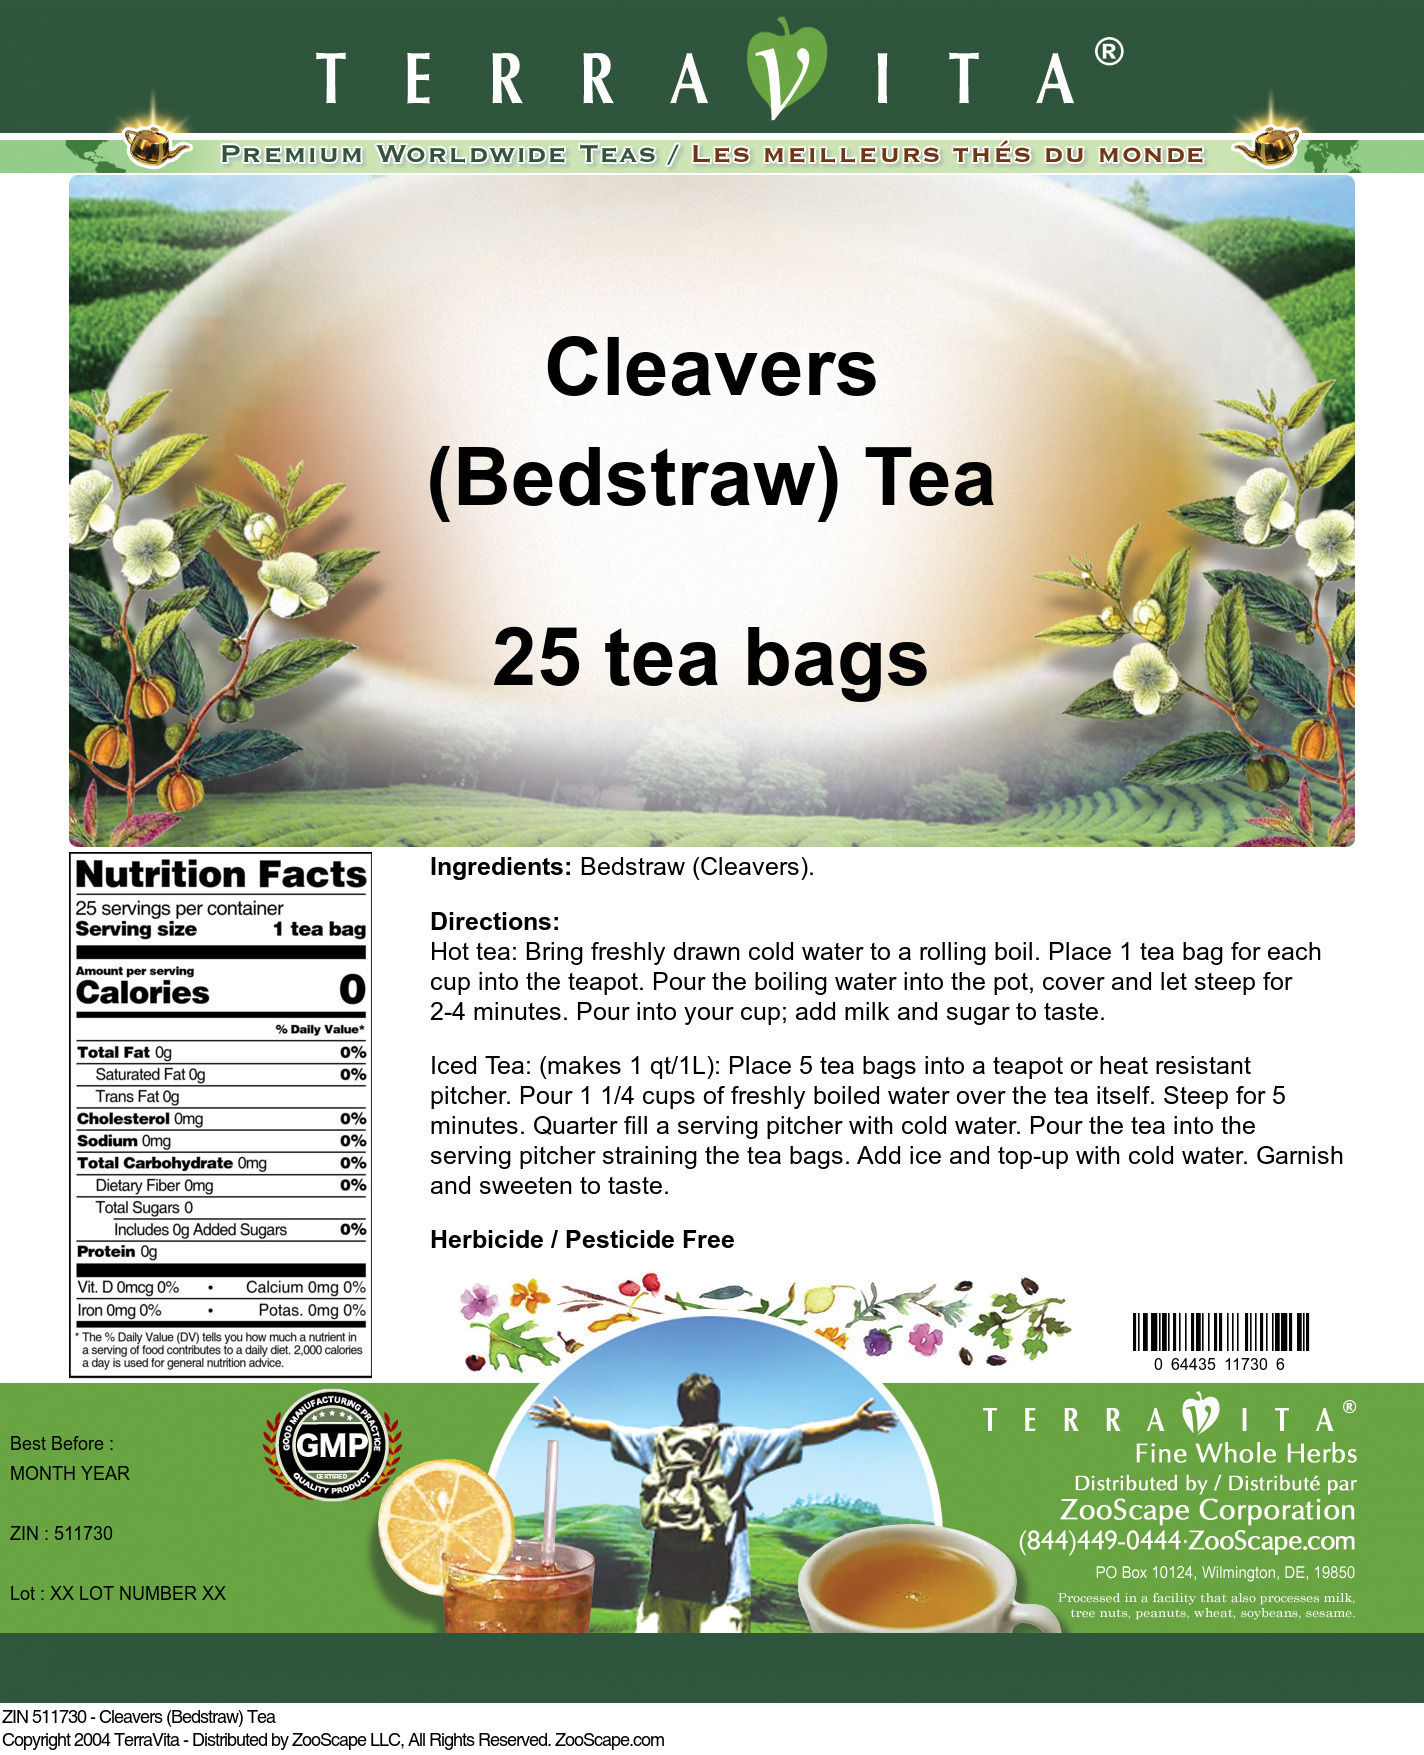 Cleavers (Bedstraw) Tea